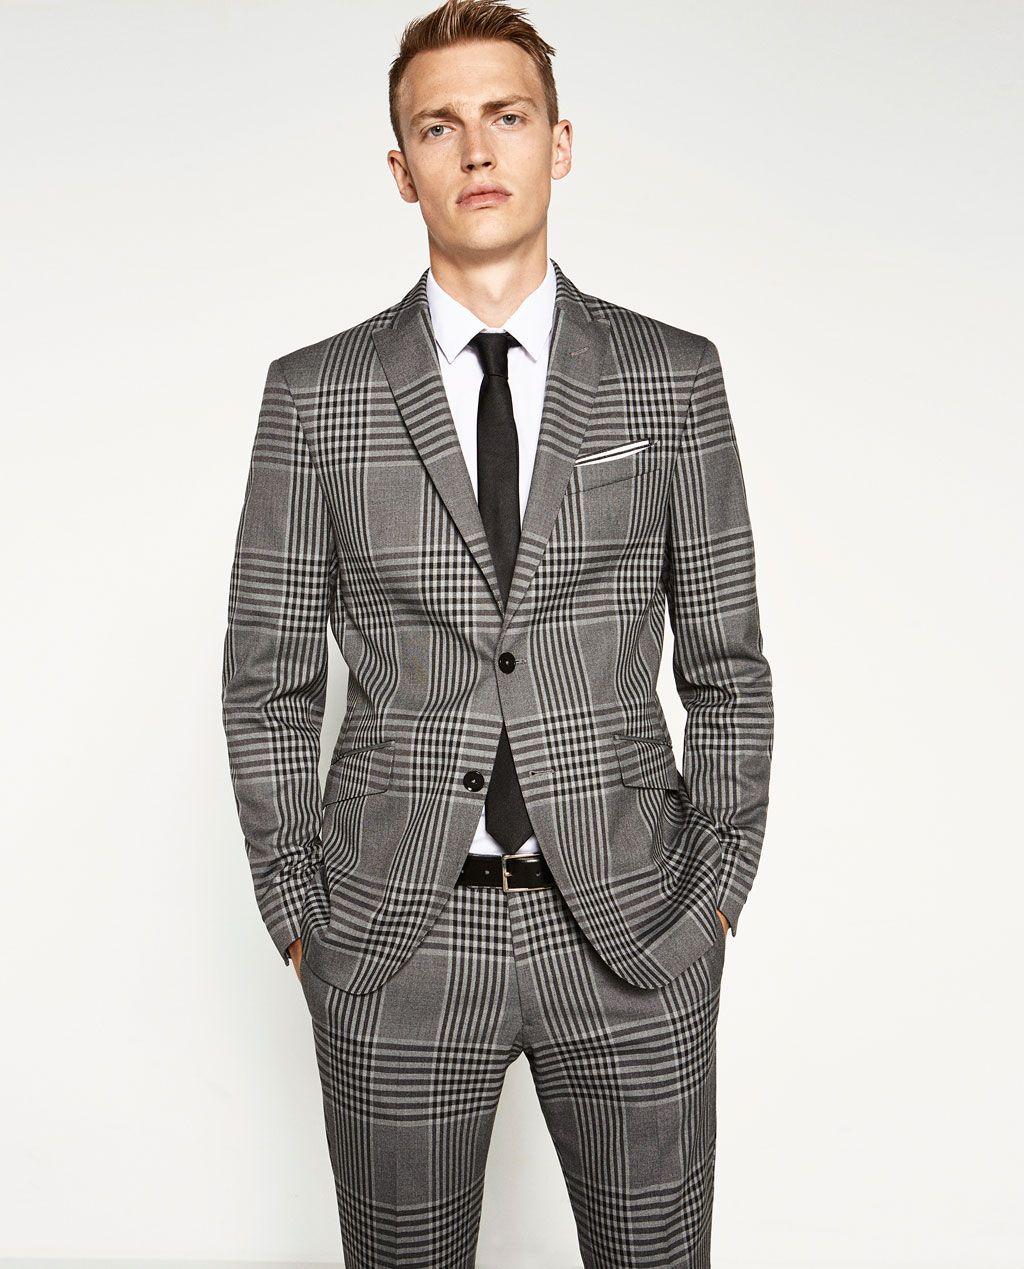 Image 2 De Blazer à Carreaux De Zara Style En 2019 Style